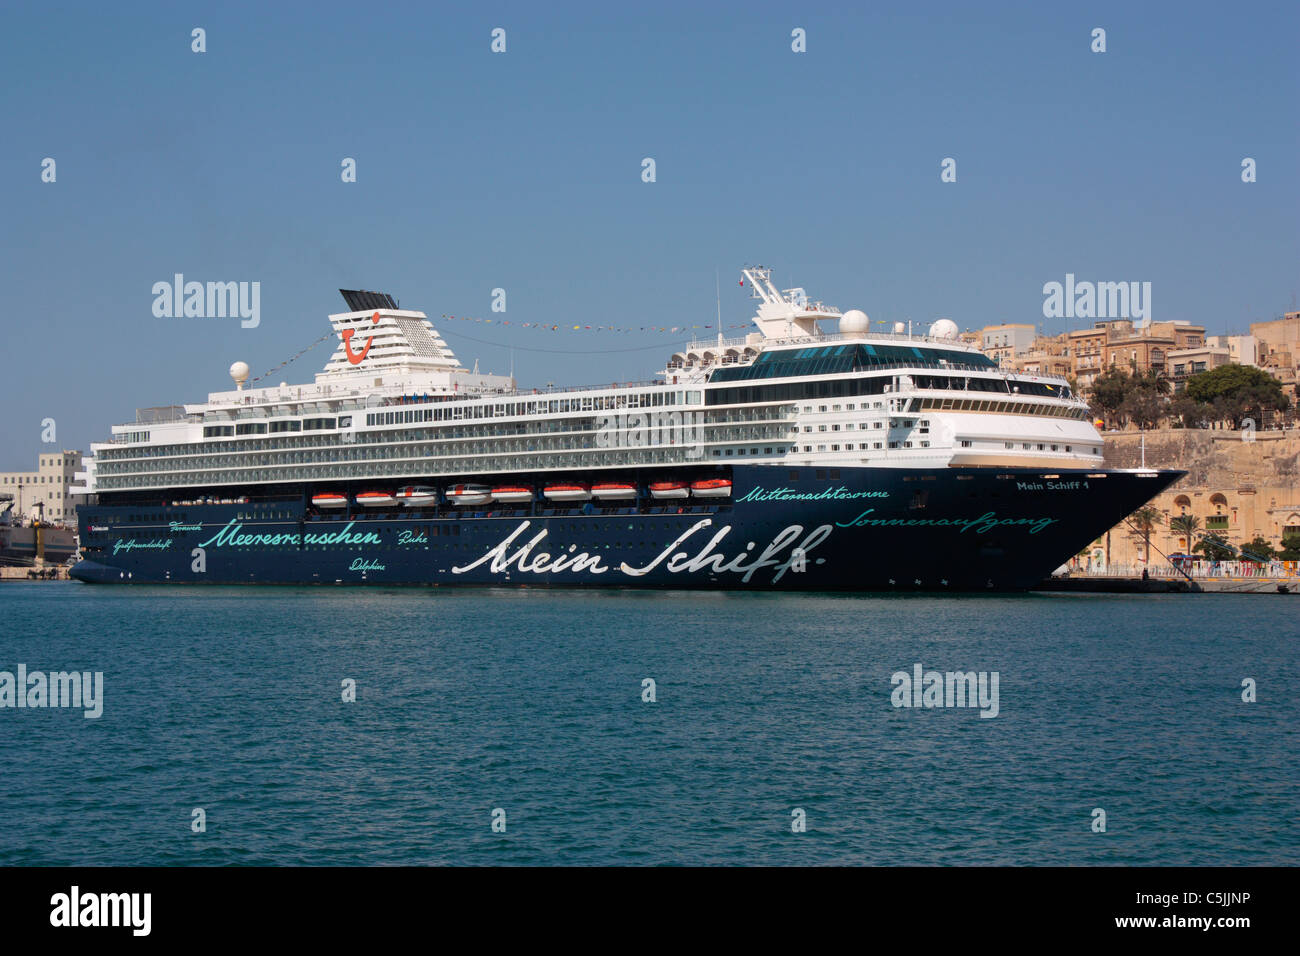 Tourism in the Mediterranean. The TUI cruise ship Mein Schiff 1 in Malta's Grand Harbour - Stock Image